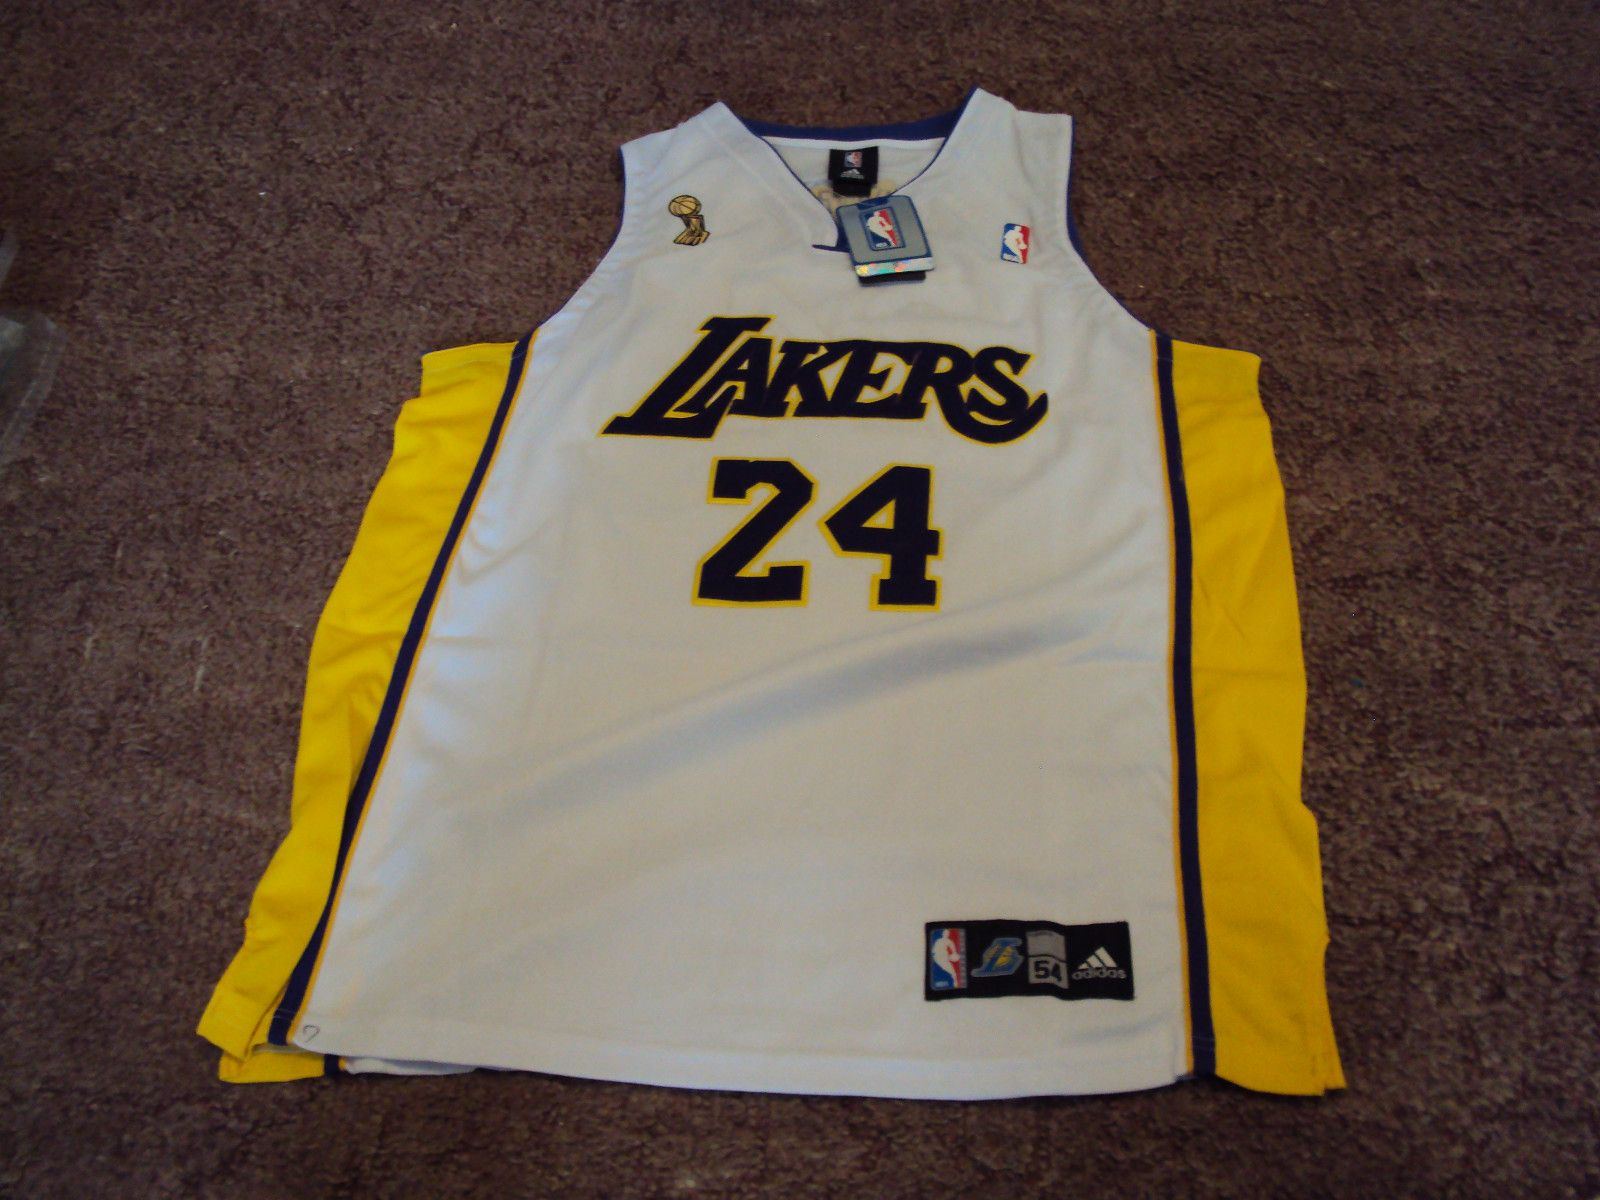 24 KOBE BRYANT Los Angeles Lakers NBA Shooting Guard 1996